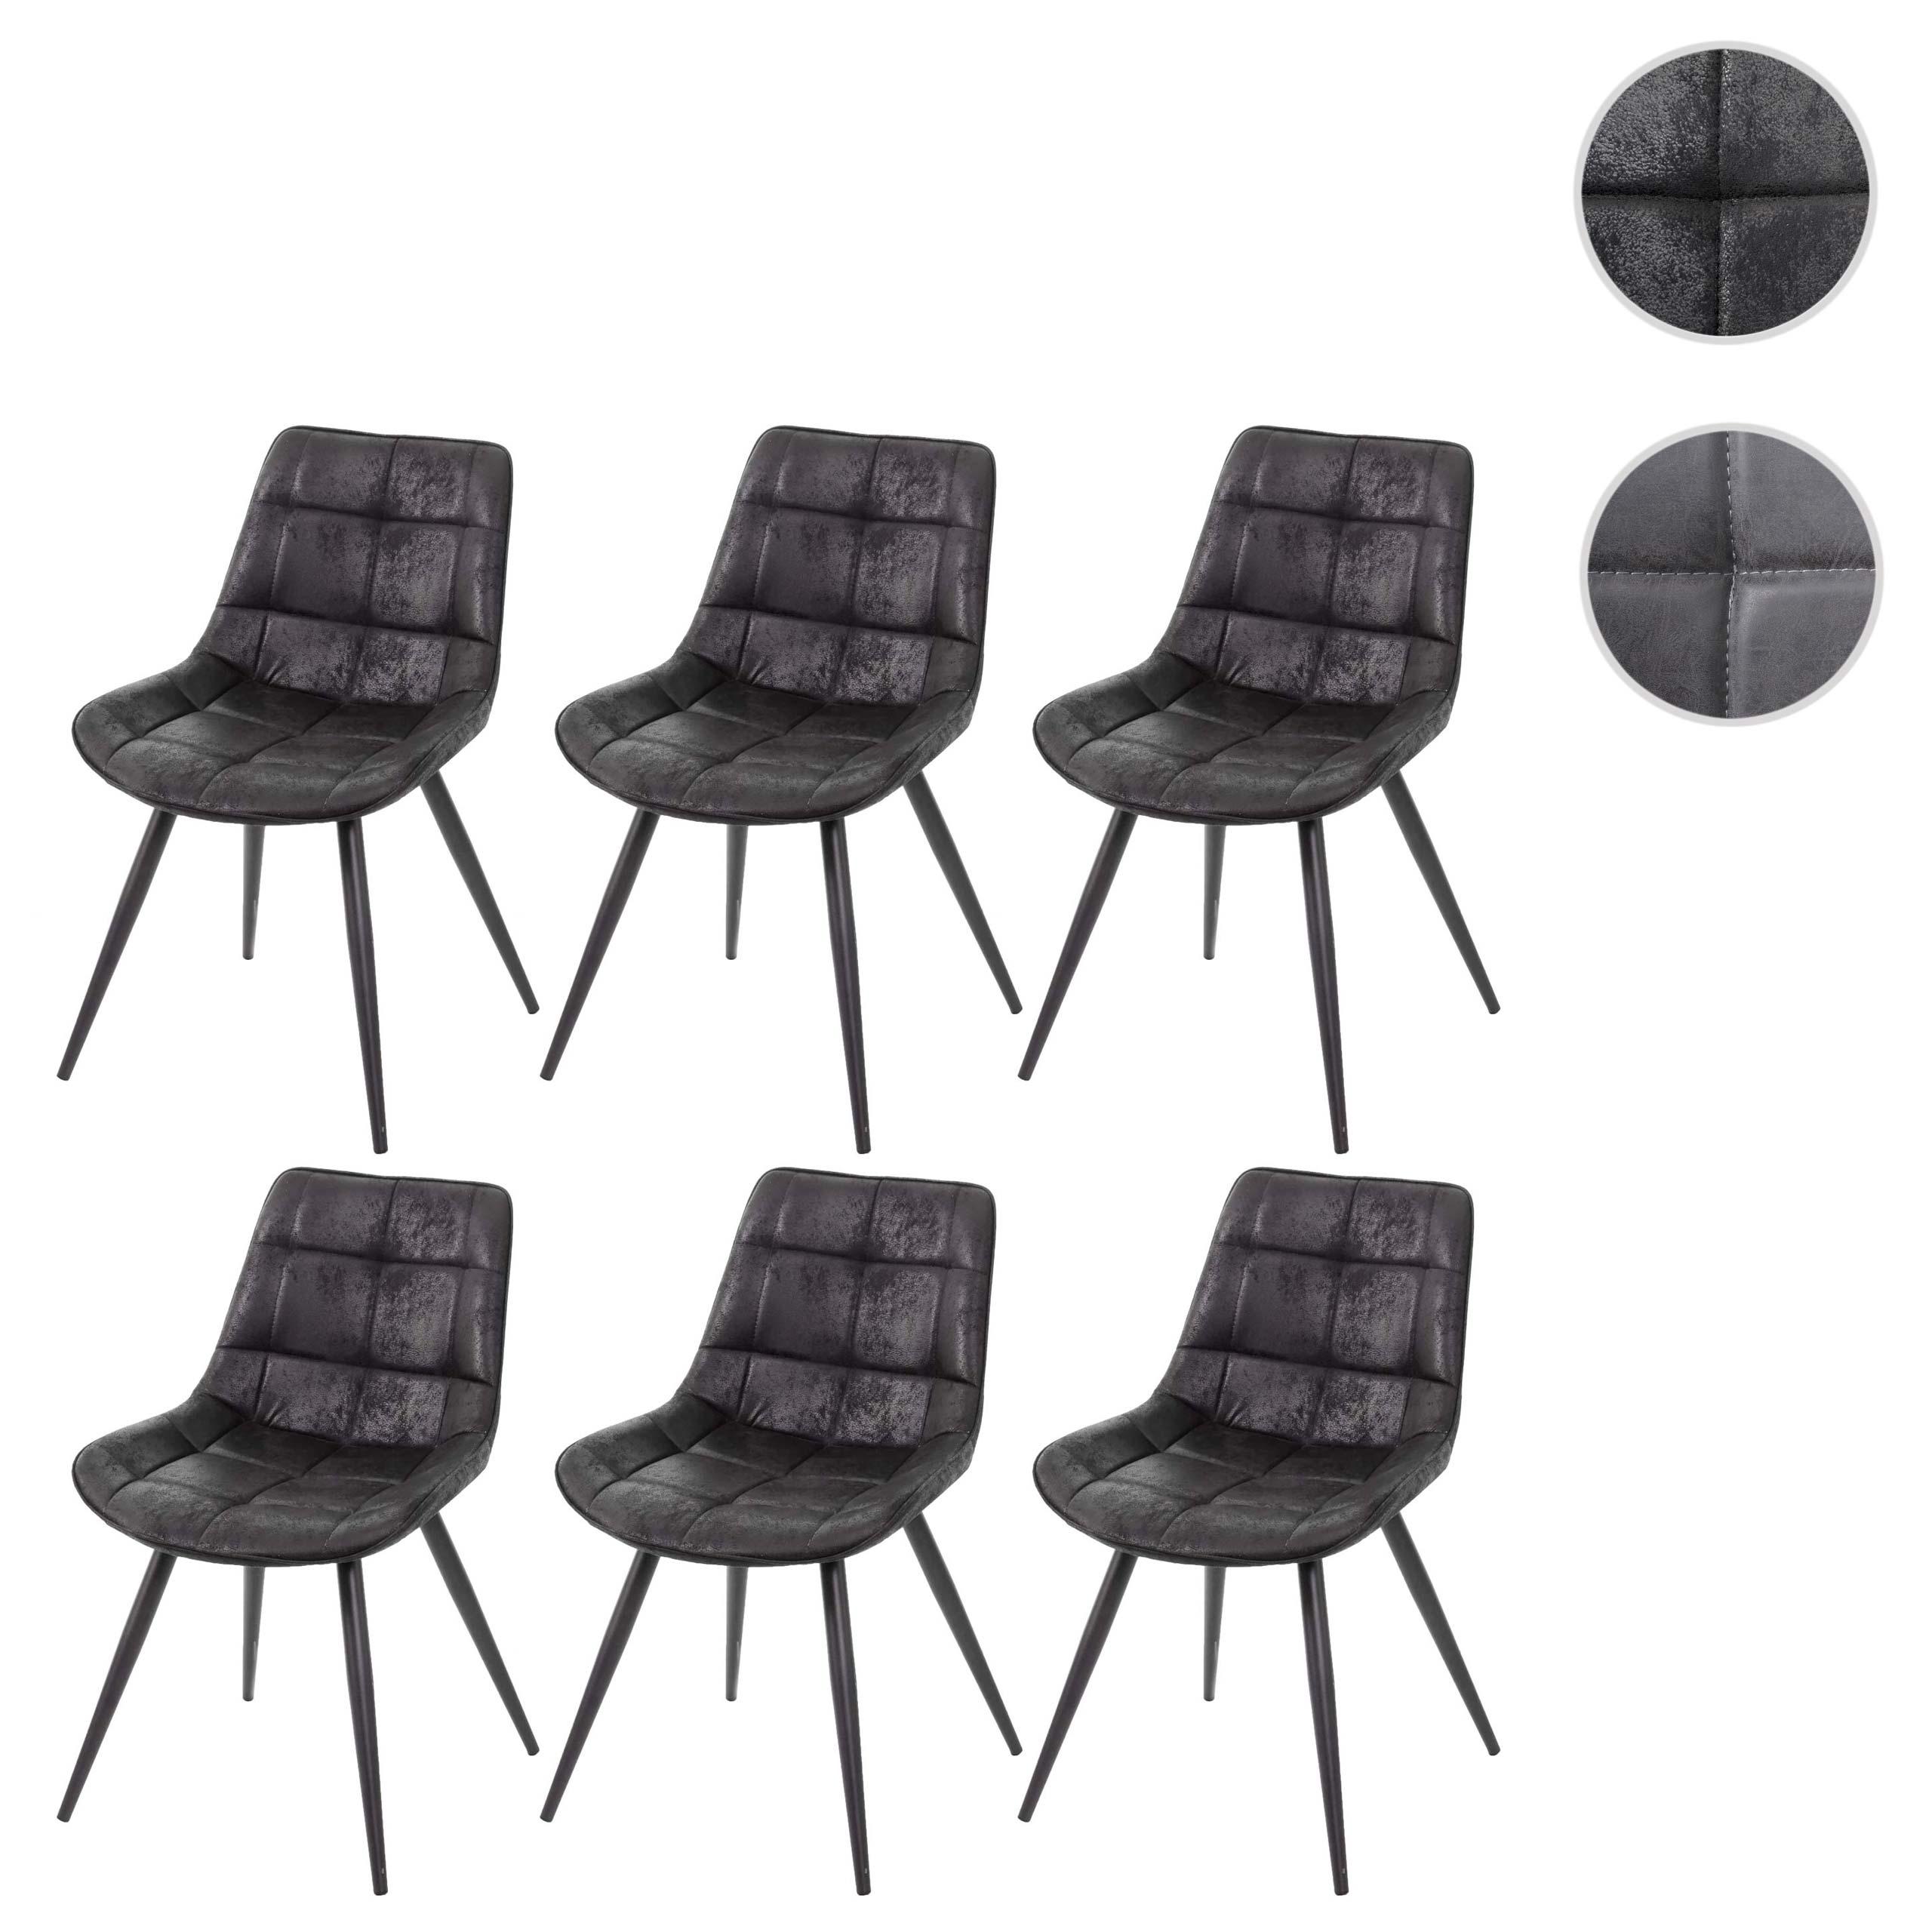 6x Esszimmerstuhl HWC E57, Stuhl Cocktailstuhl Küchenstuhl Polsterstuhl, Retro Wildleder Optik